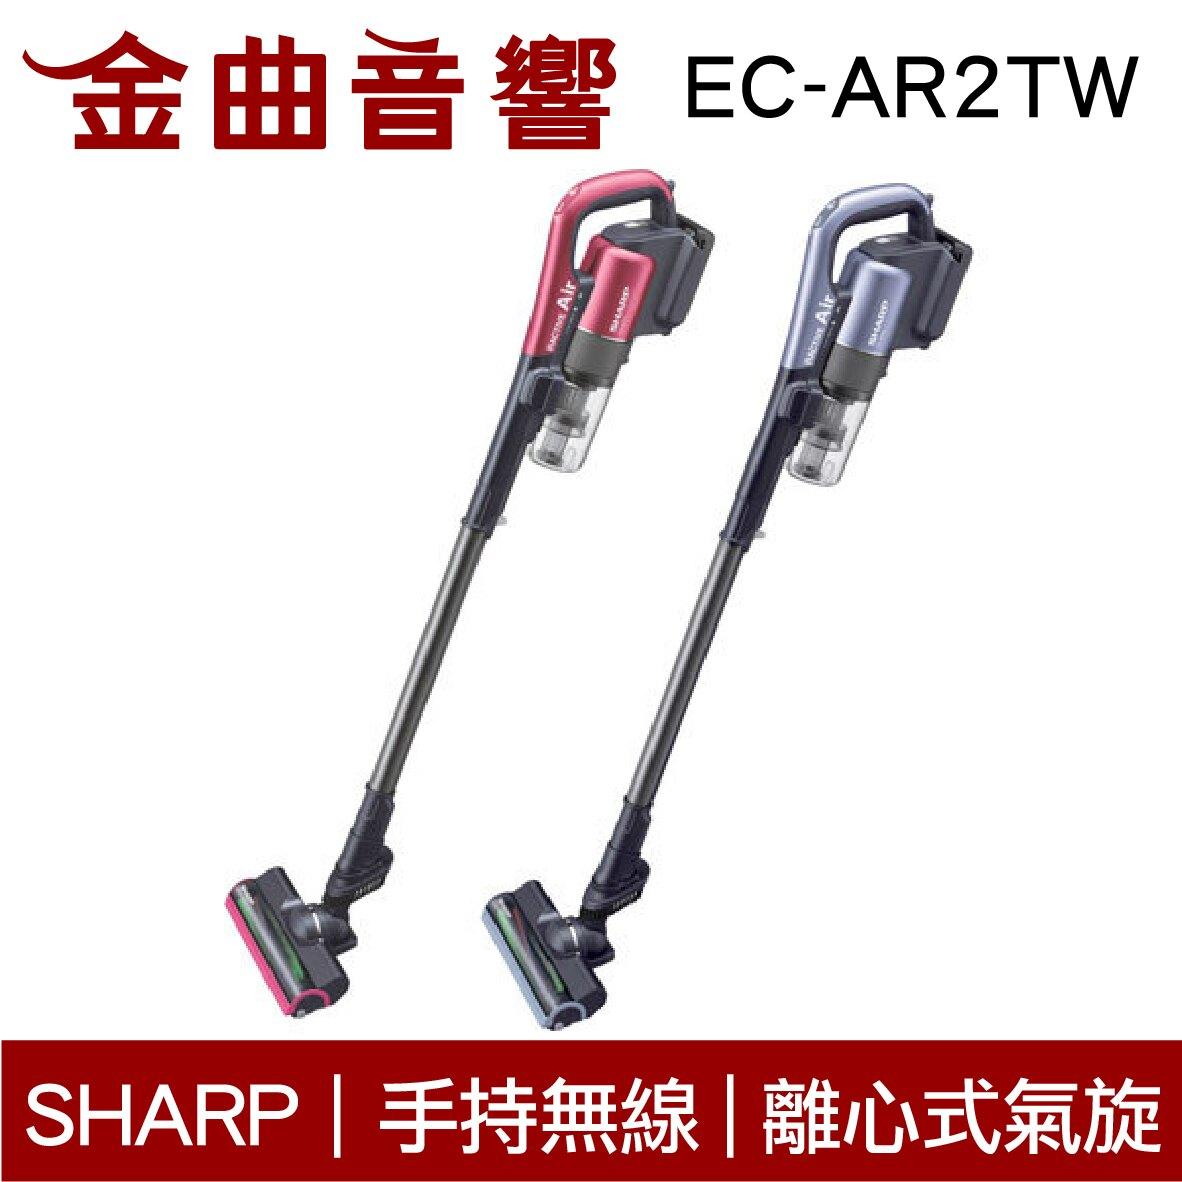 SHARP 夏普 EC-AR2TW 魔力紅 碳纖維輕巧無線 吸塵器| 金曲音響